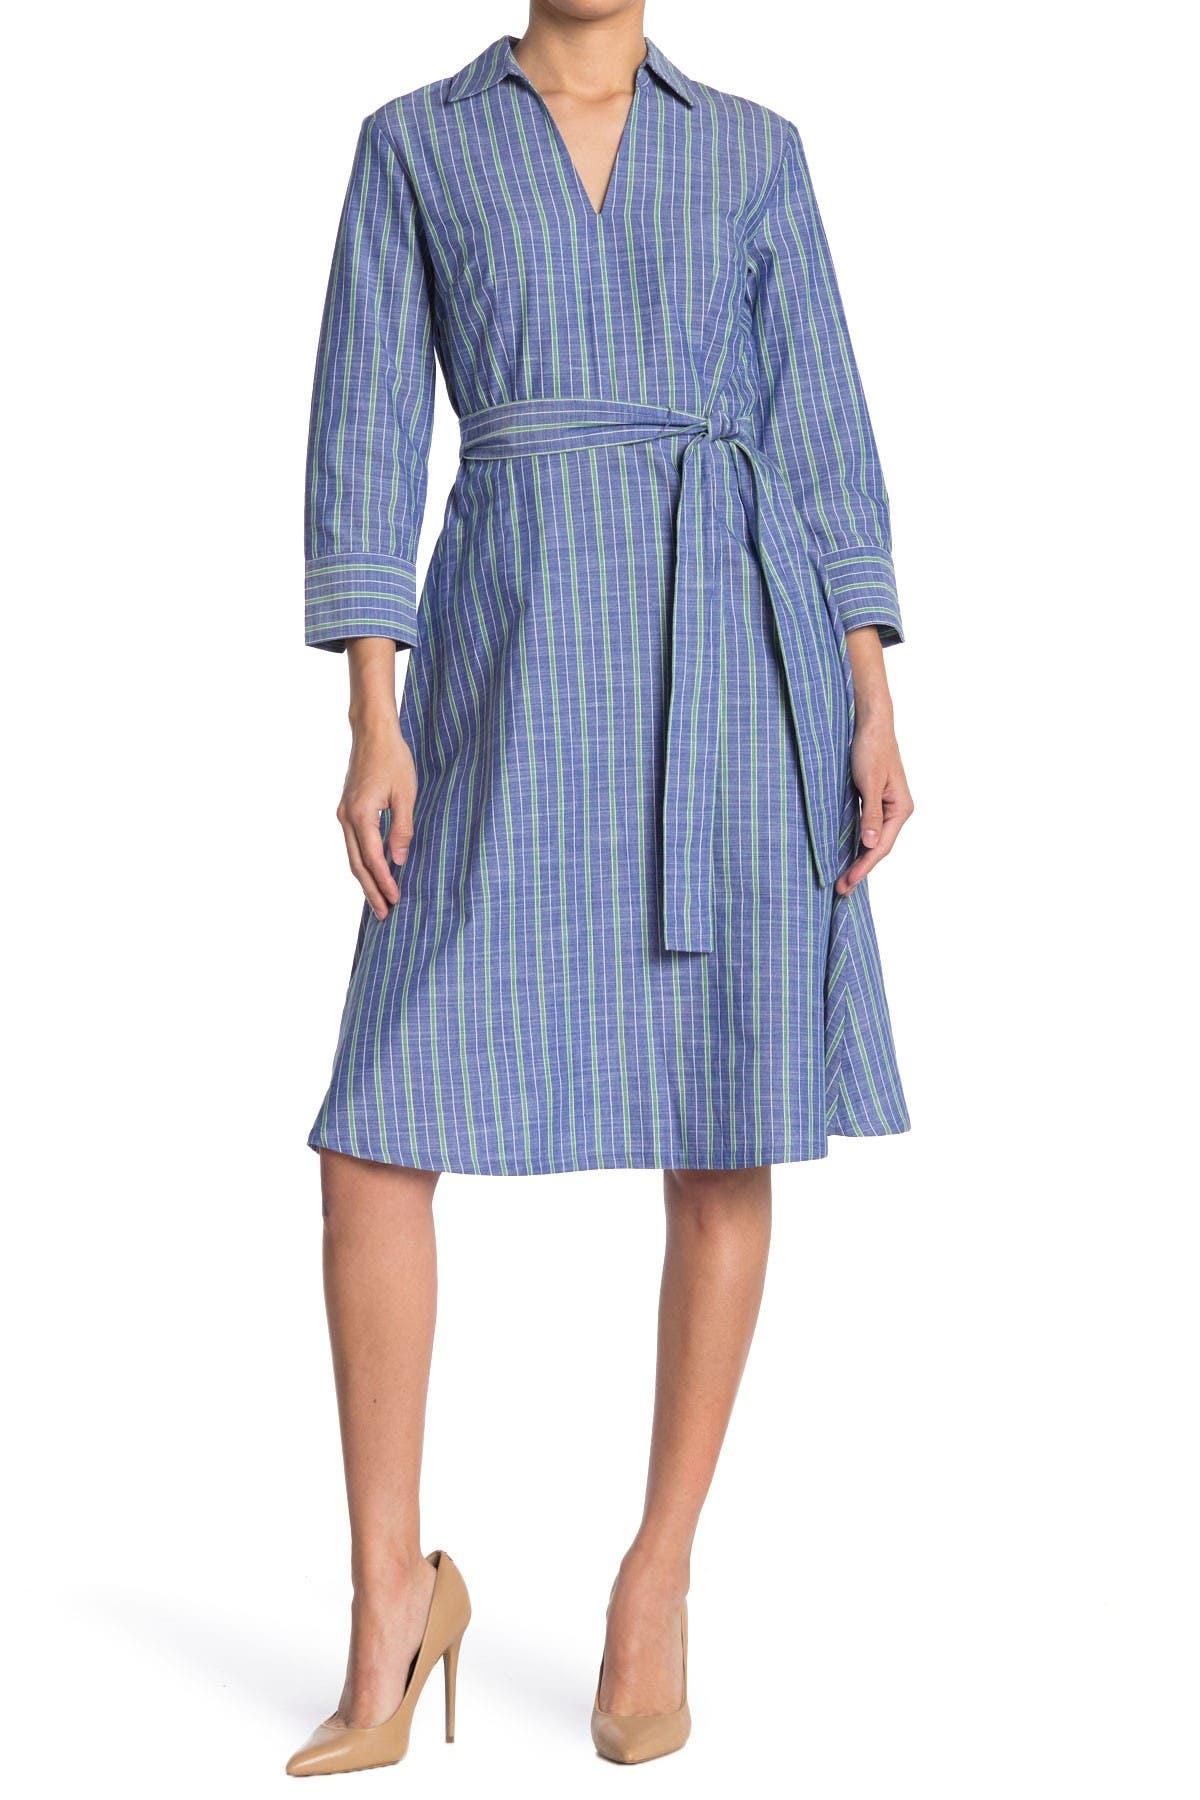 Image of Tommy Hilfiger Striped 3/4 Sleeve Chambray Shirt Dress